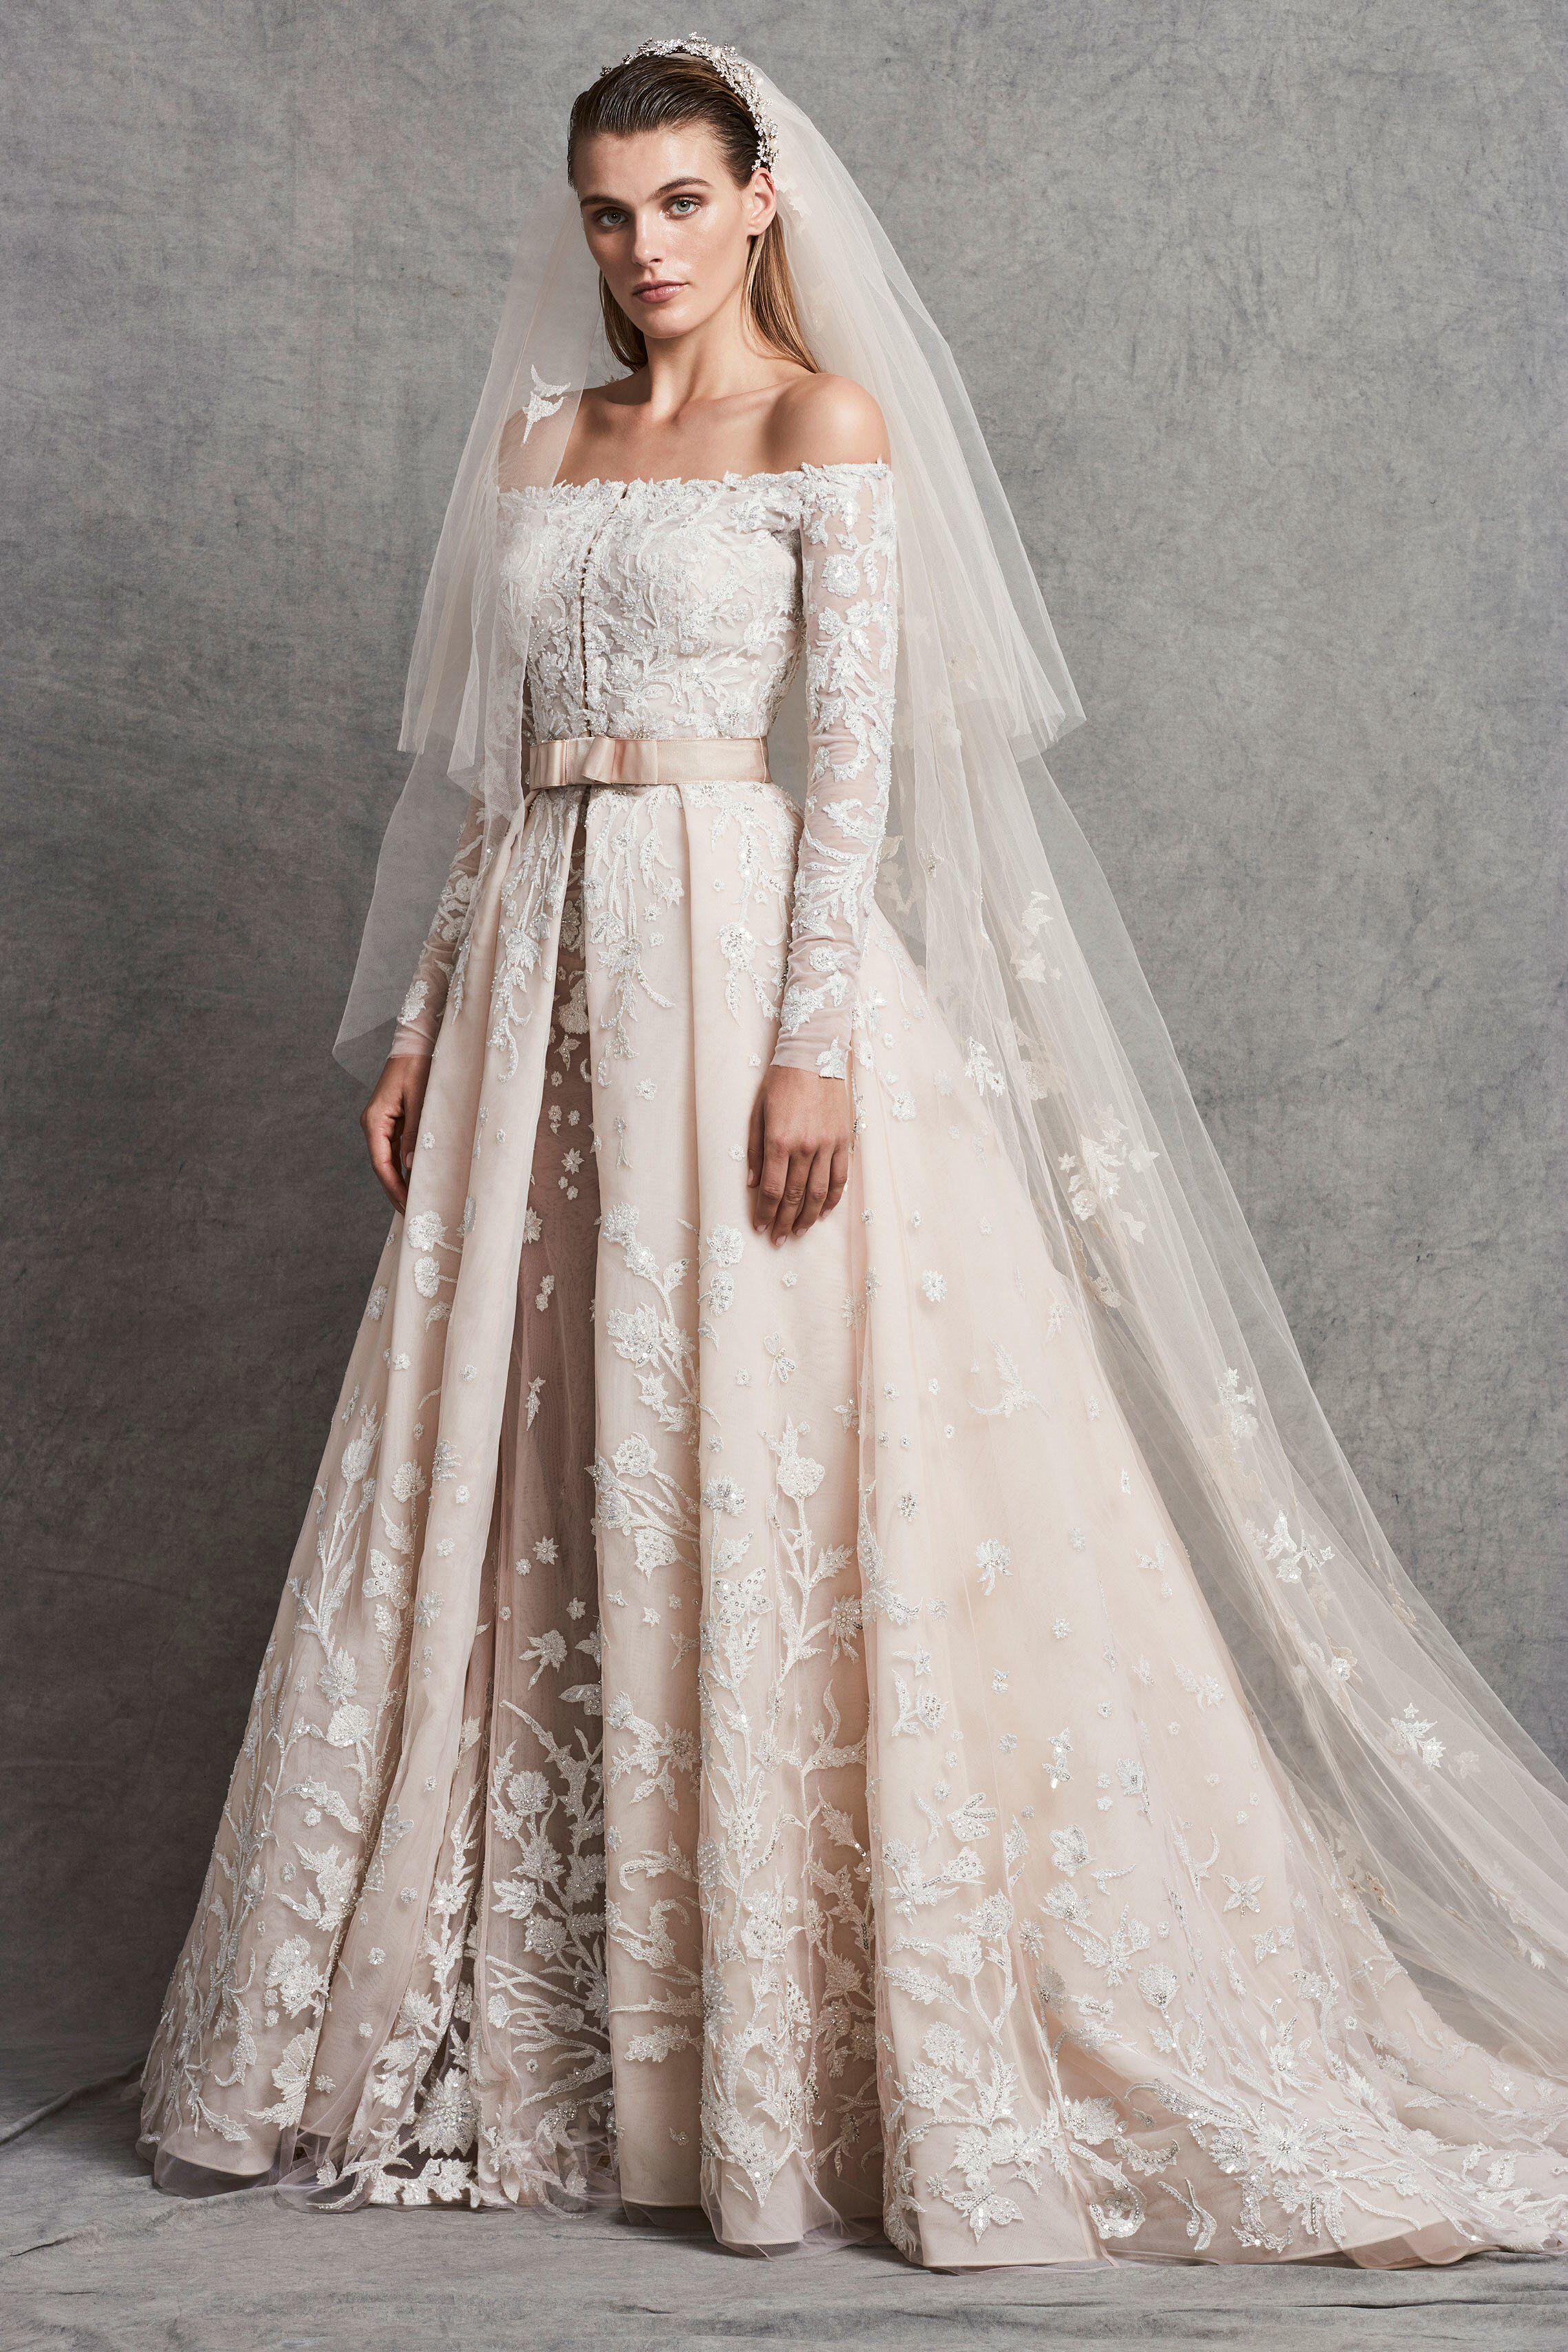 c0fb426d2 فساتين زفاف مبهرة, احلى فساتين زفاف - منتديات حوريات